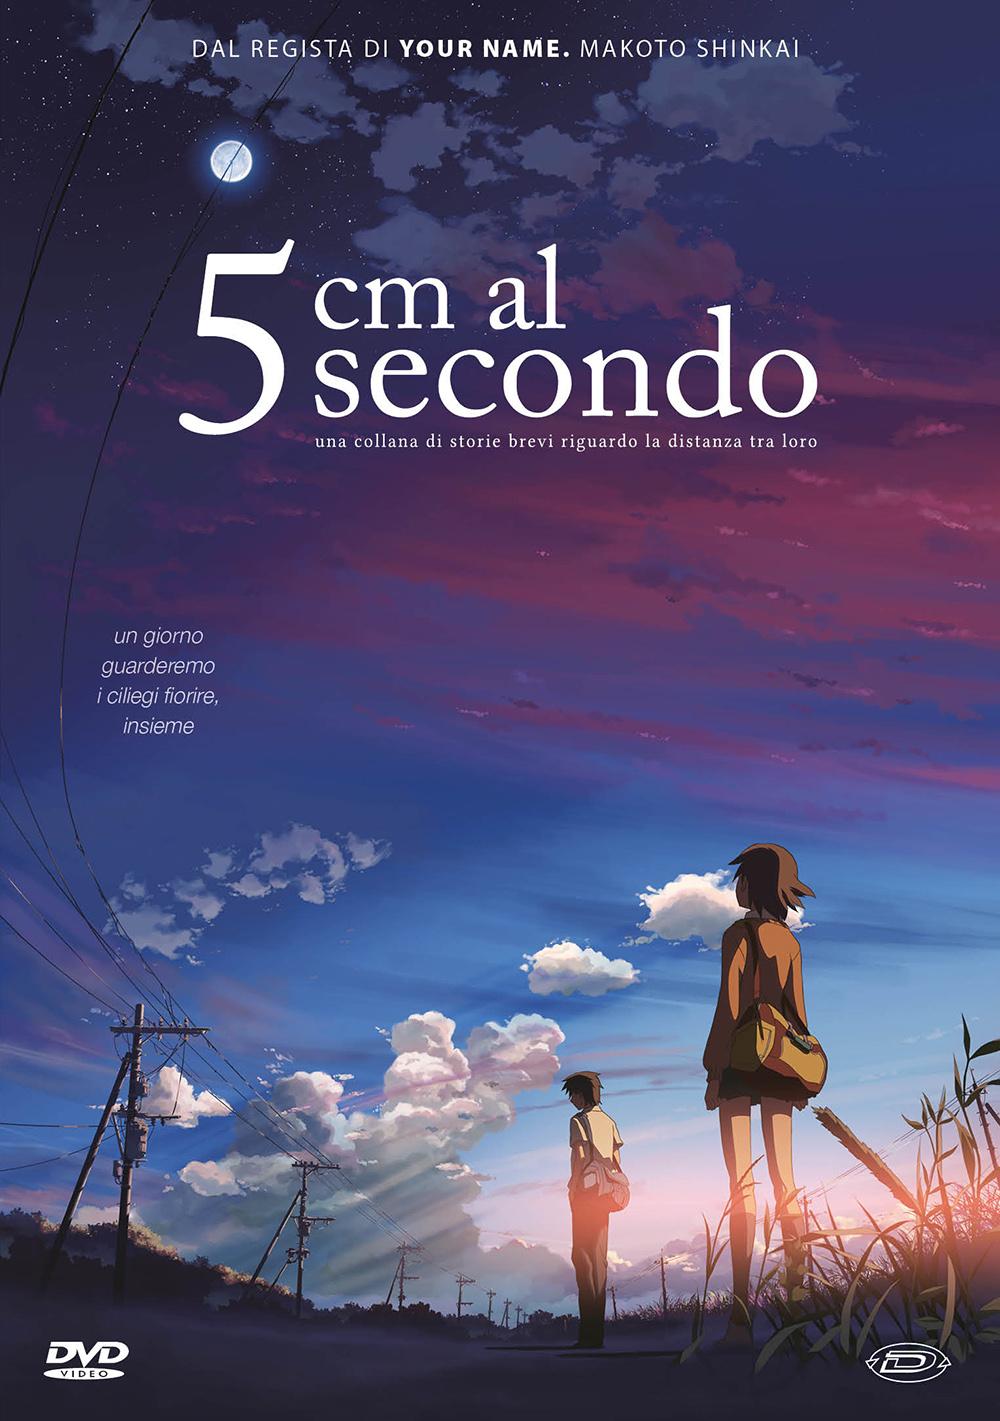 5 CM AL SECONDO (STANDARD EDITION) (DVD)